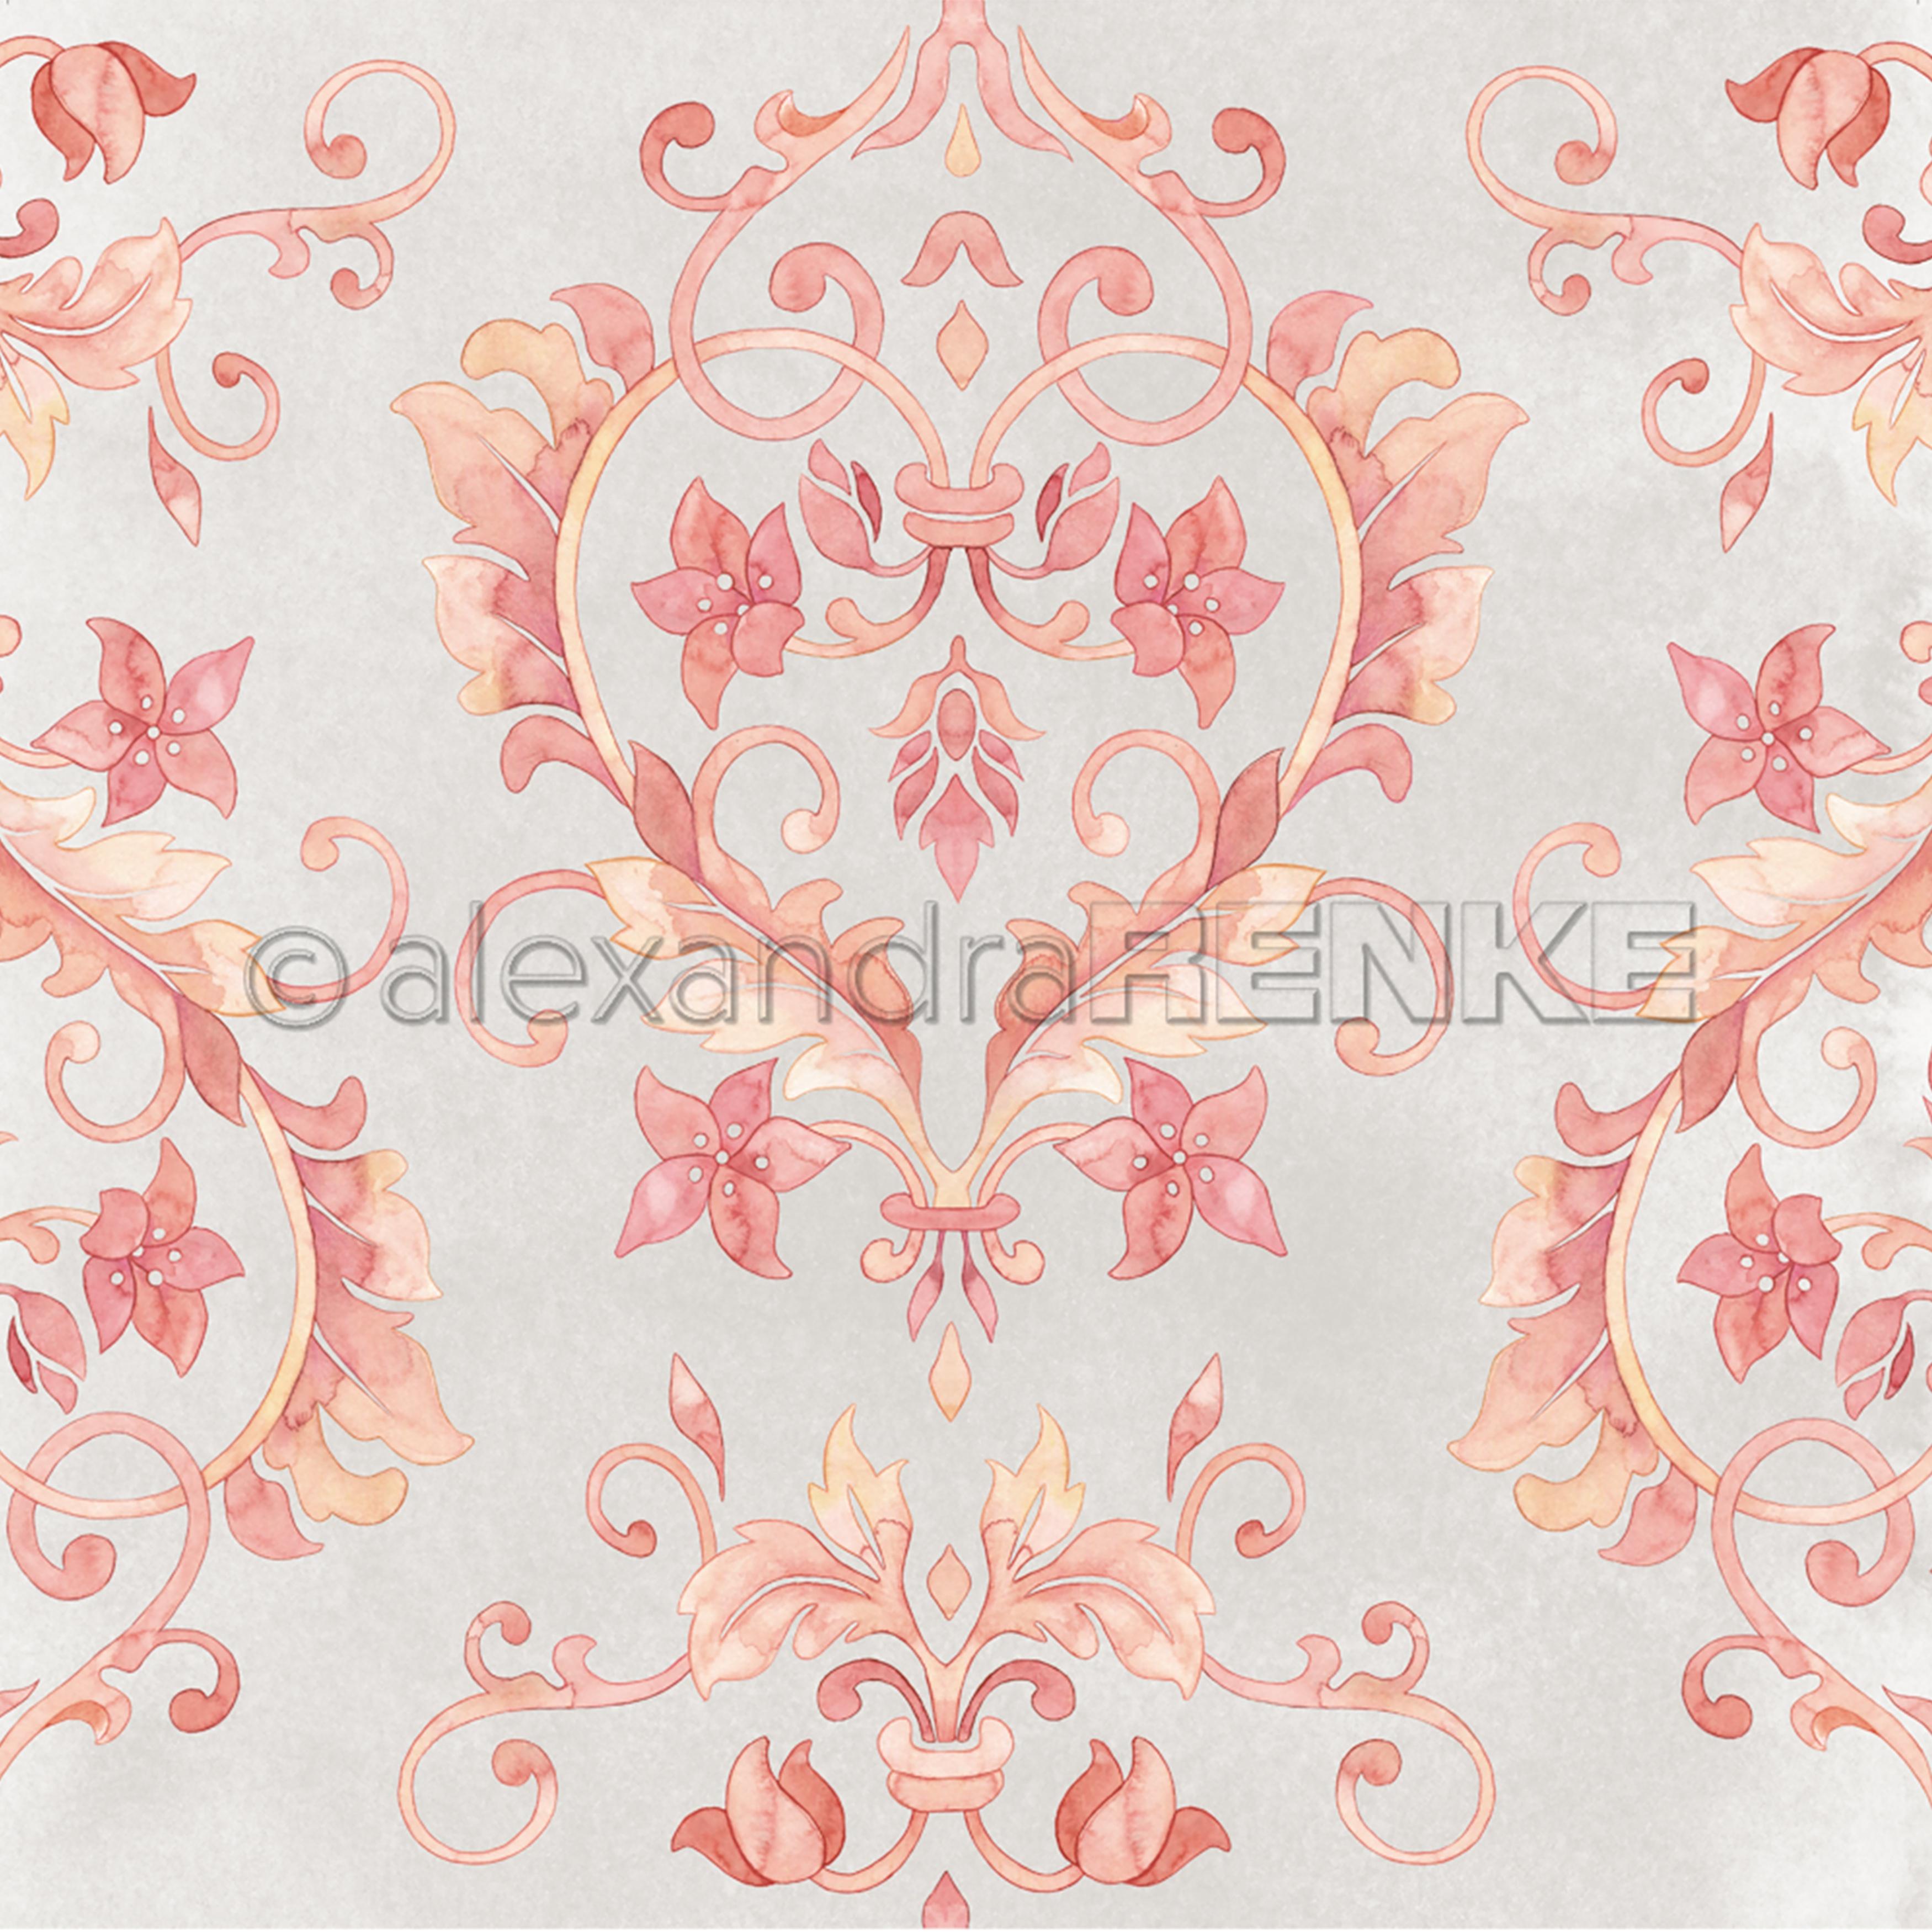 Alexandra Renke Ornamentic Paper 12X12-Heart Vine Reds